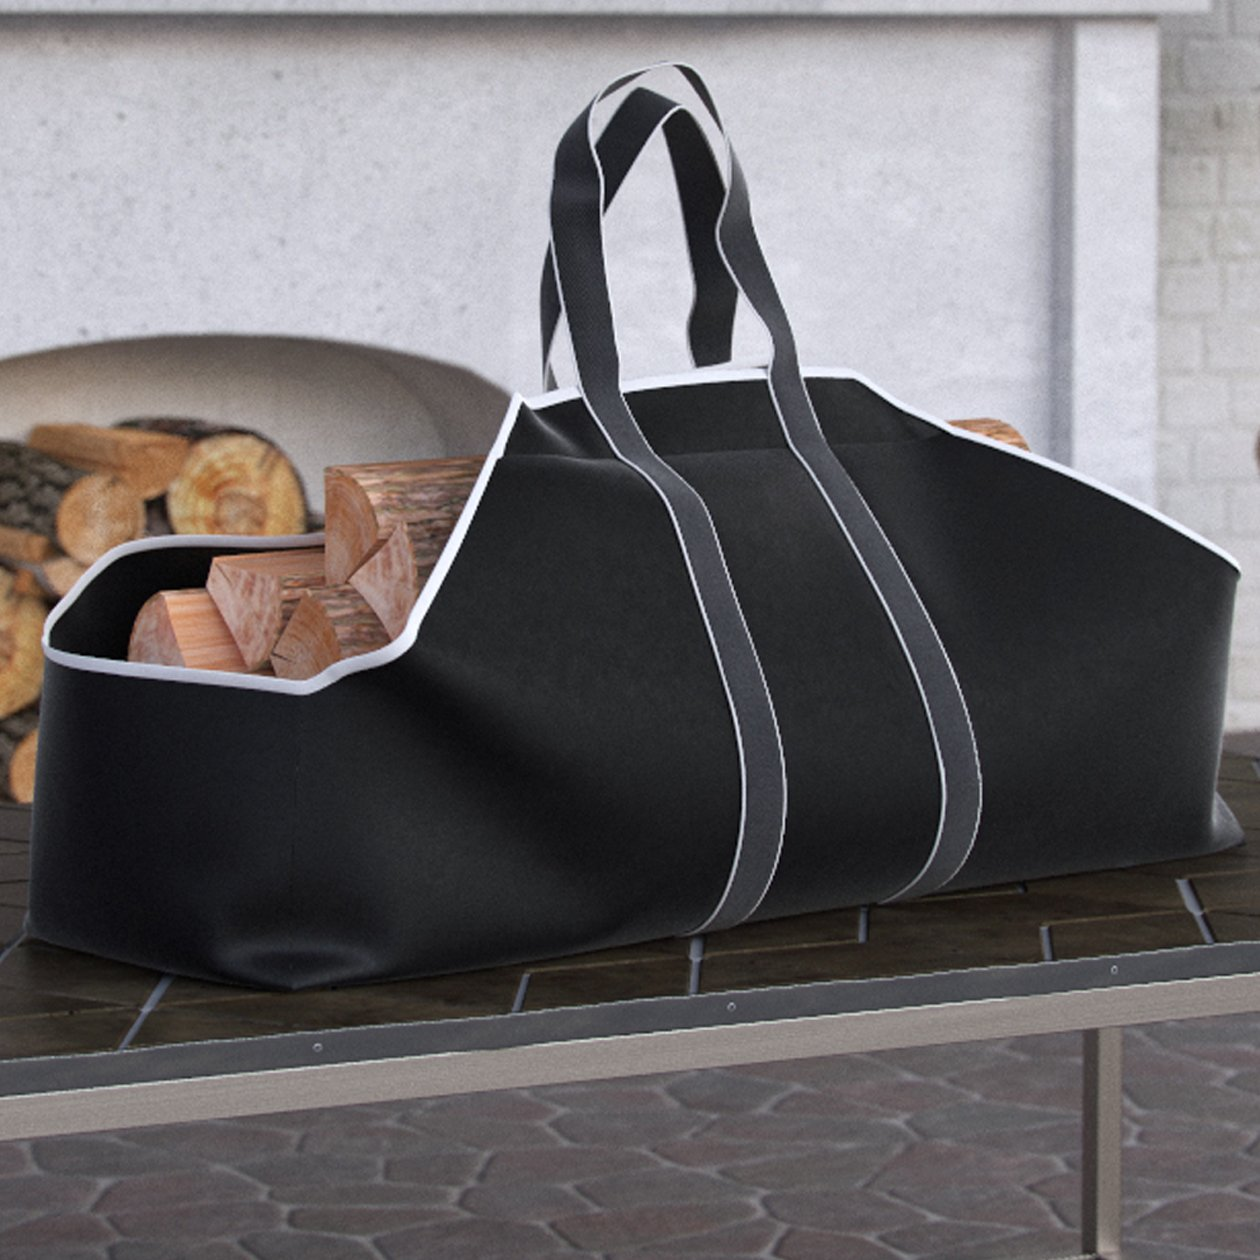 Large Canvas Log Carrier Tote Bag Indoor Firewood Carry